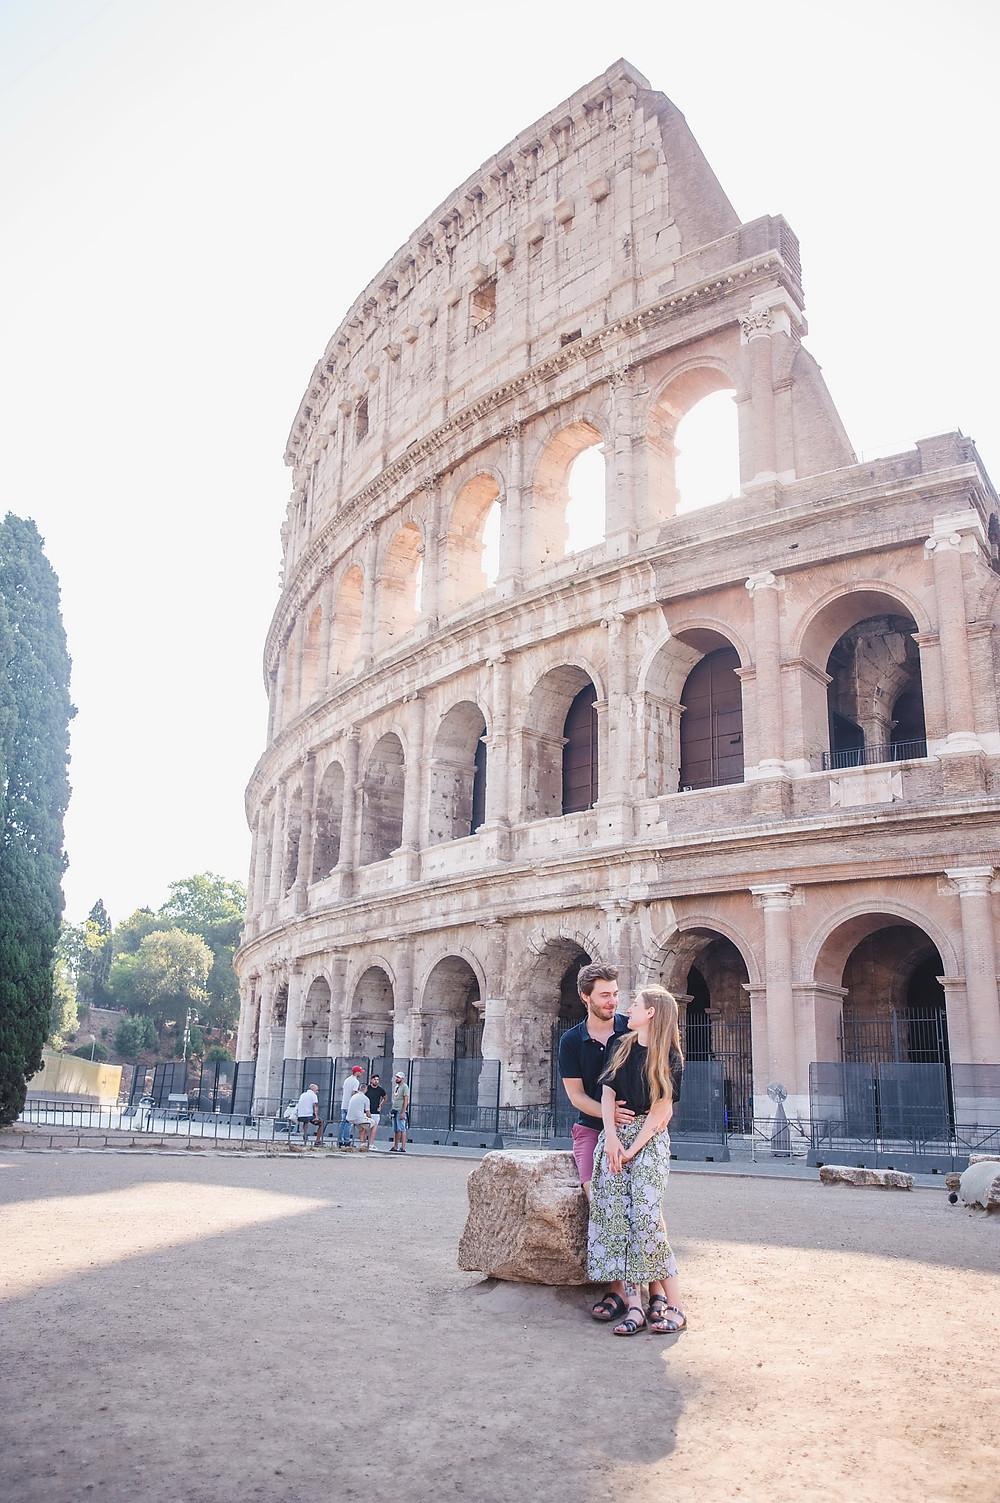 love story photo shoot in Rome, love story фотосессия в Риме